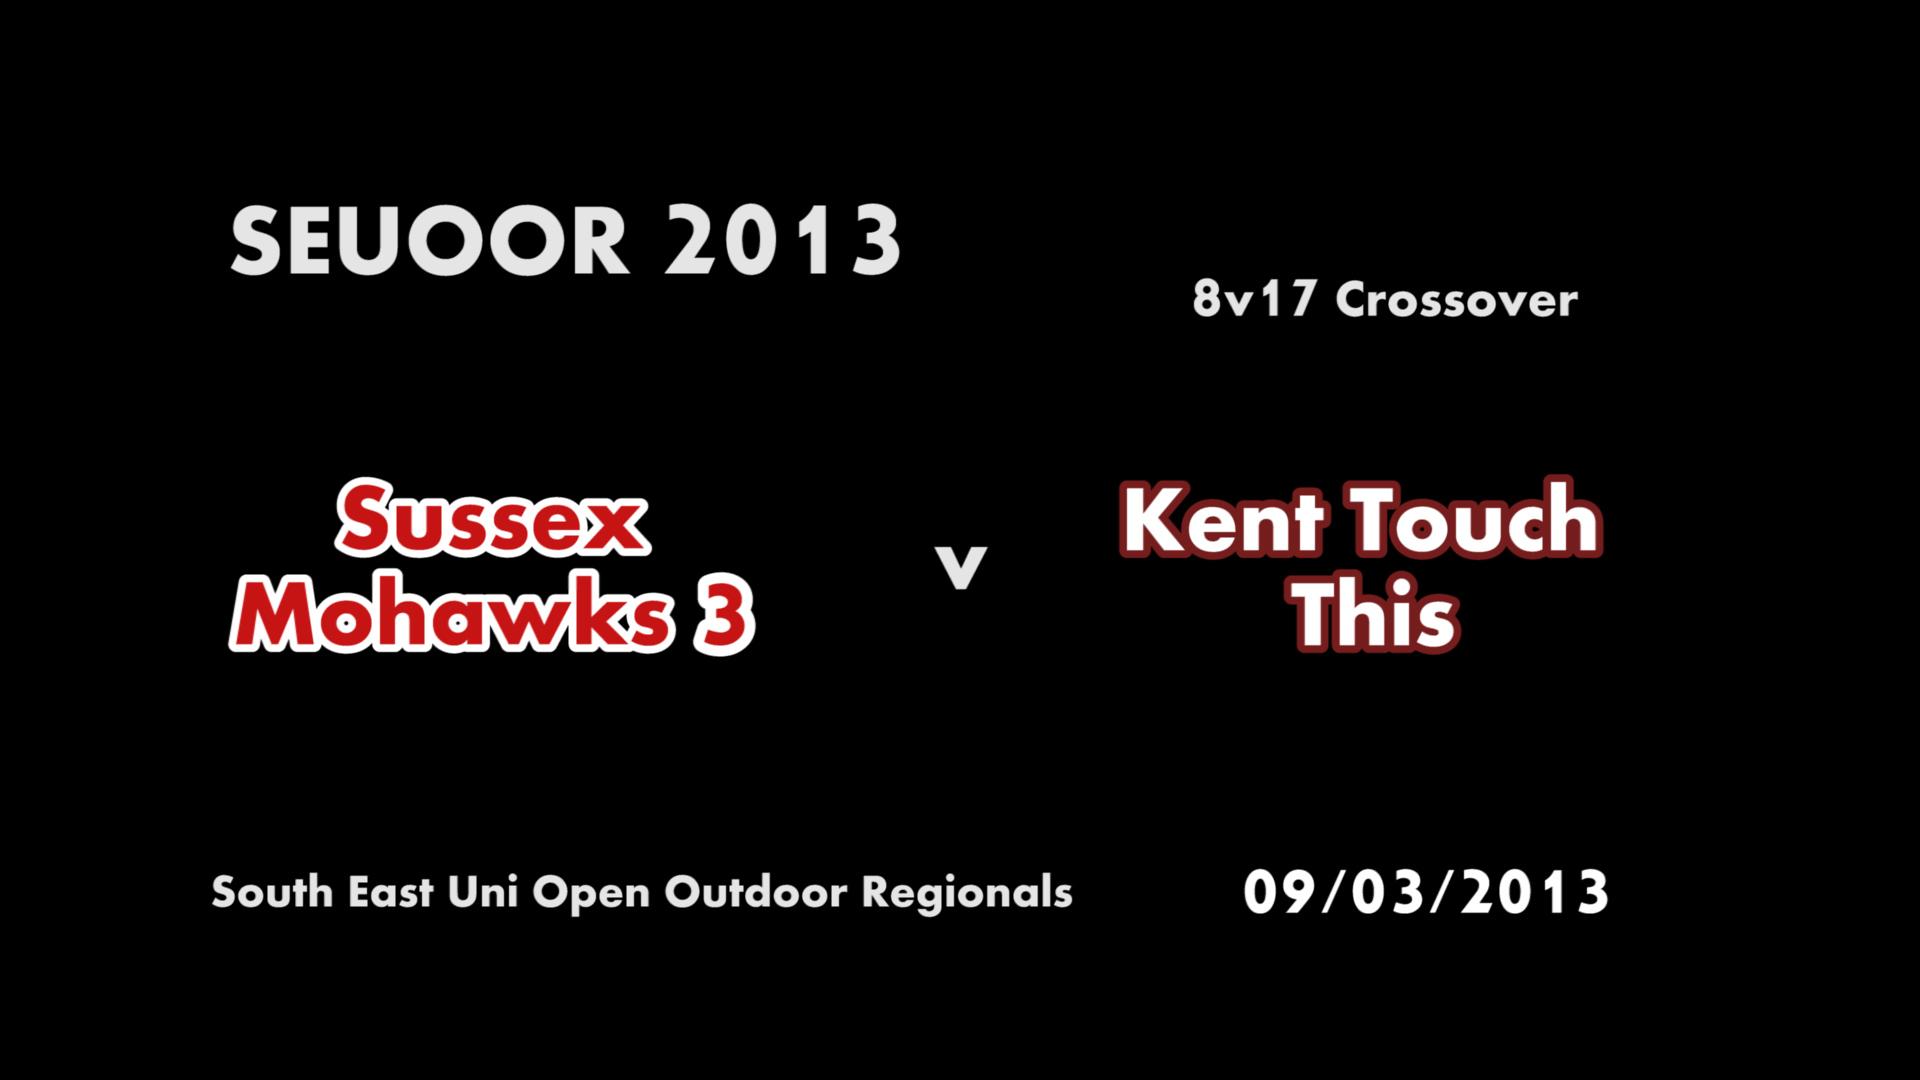 SEUOOR 2013: Mohawks 3 v Kent